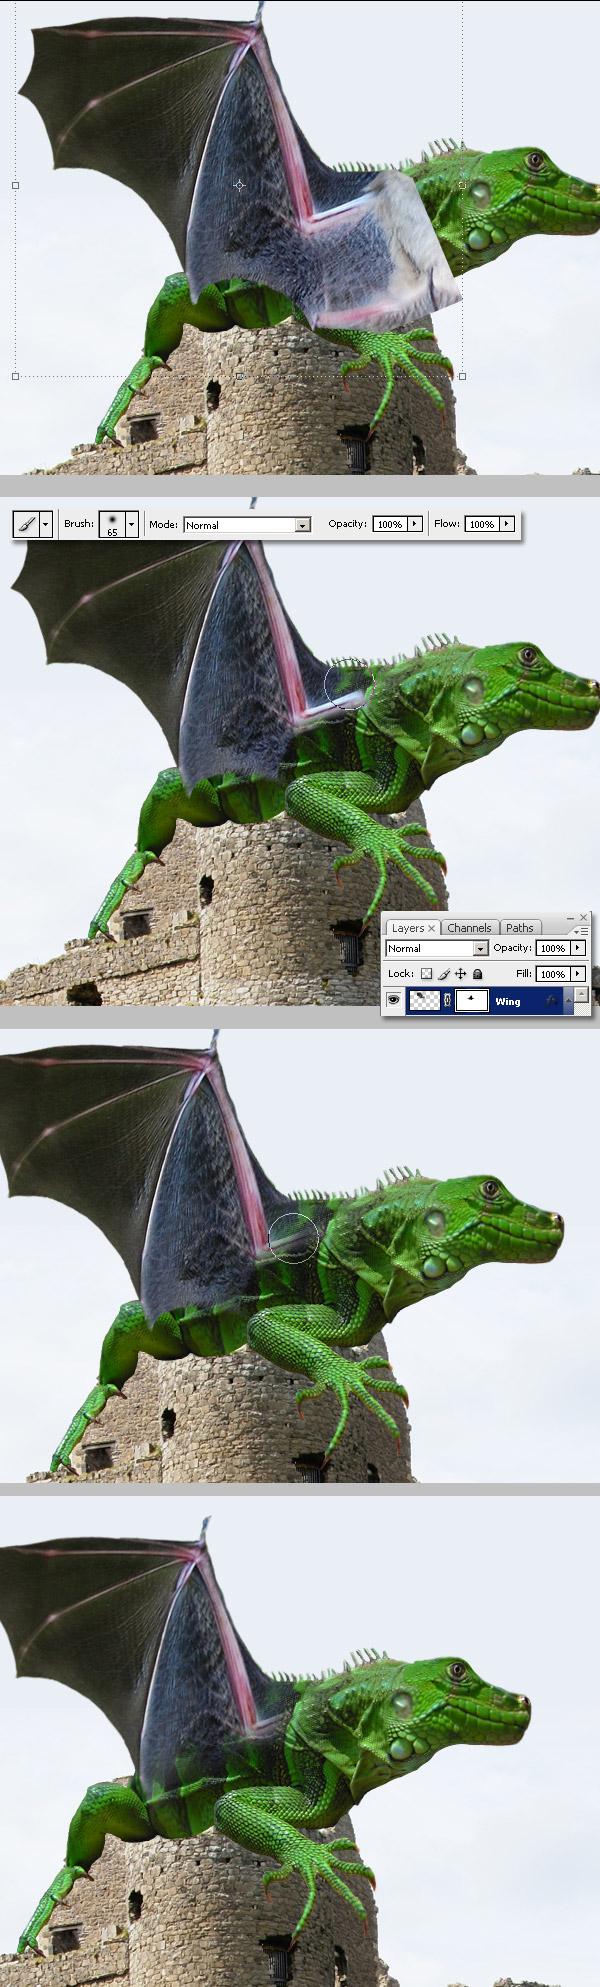 Photoshop图像合成实例:栩栩如生的翼龙_亿码酷站___亿码酷站平面设计教程插图9